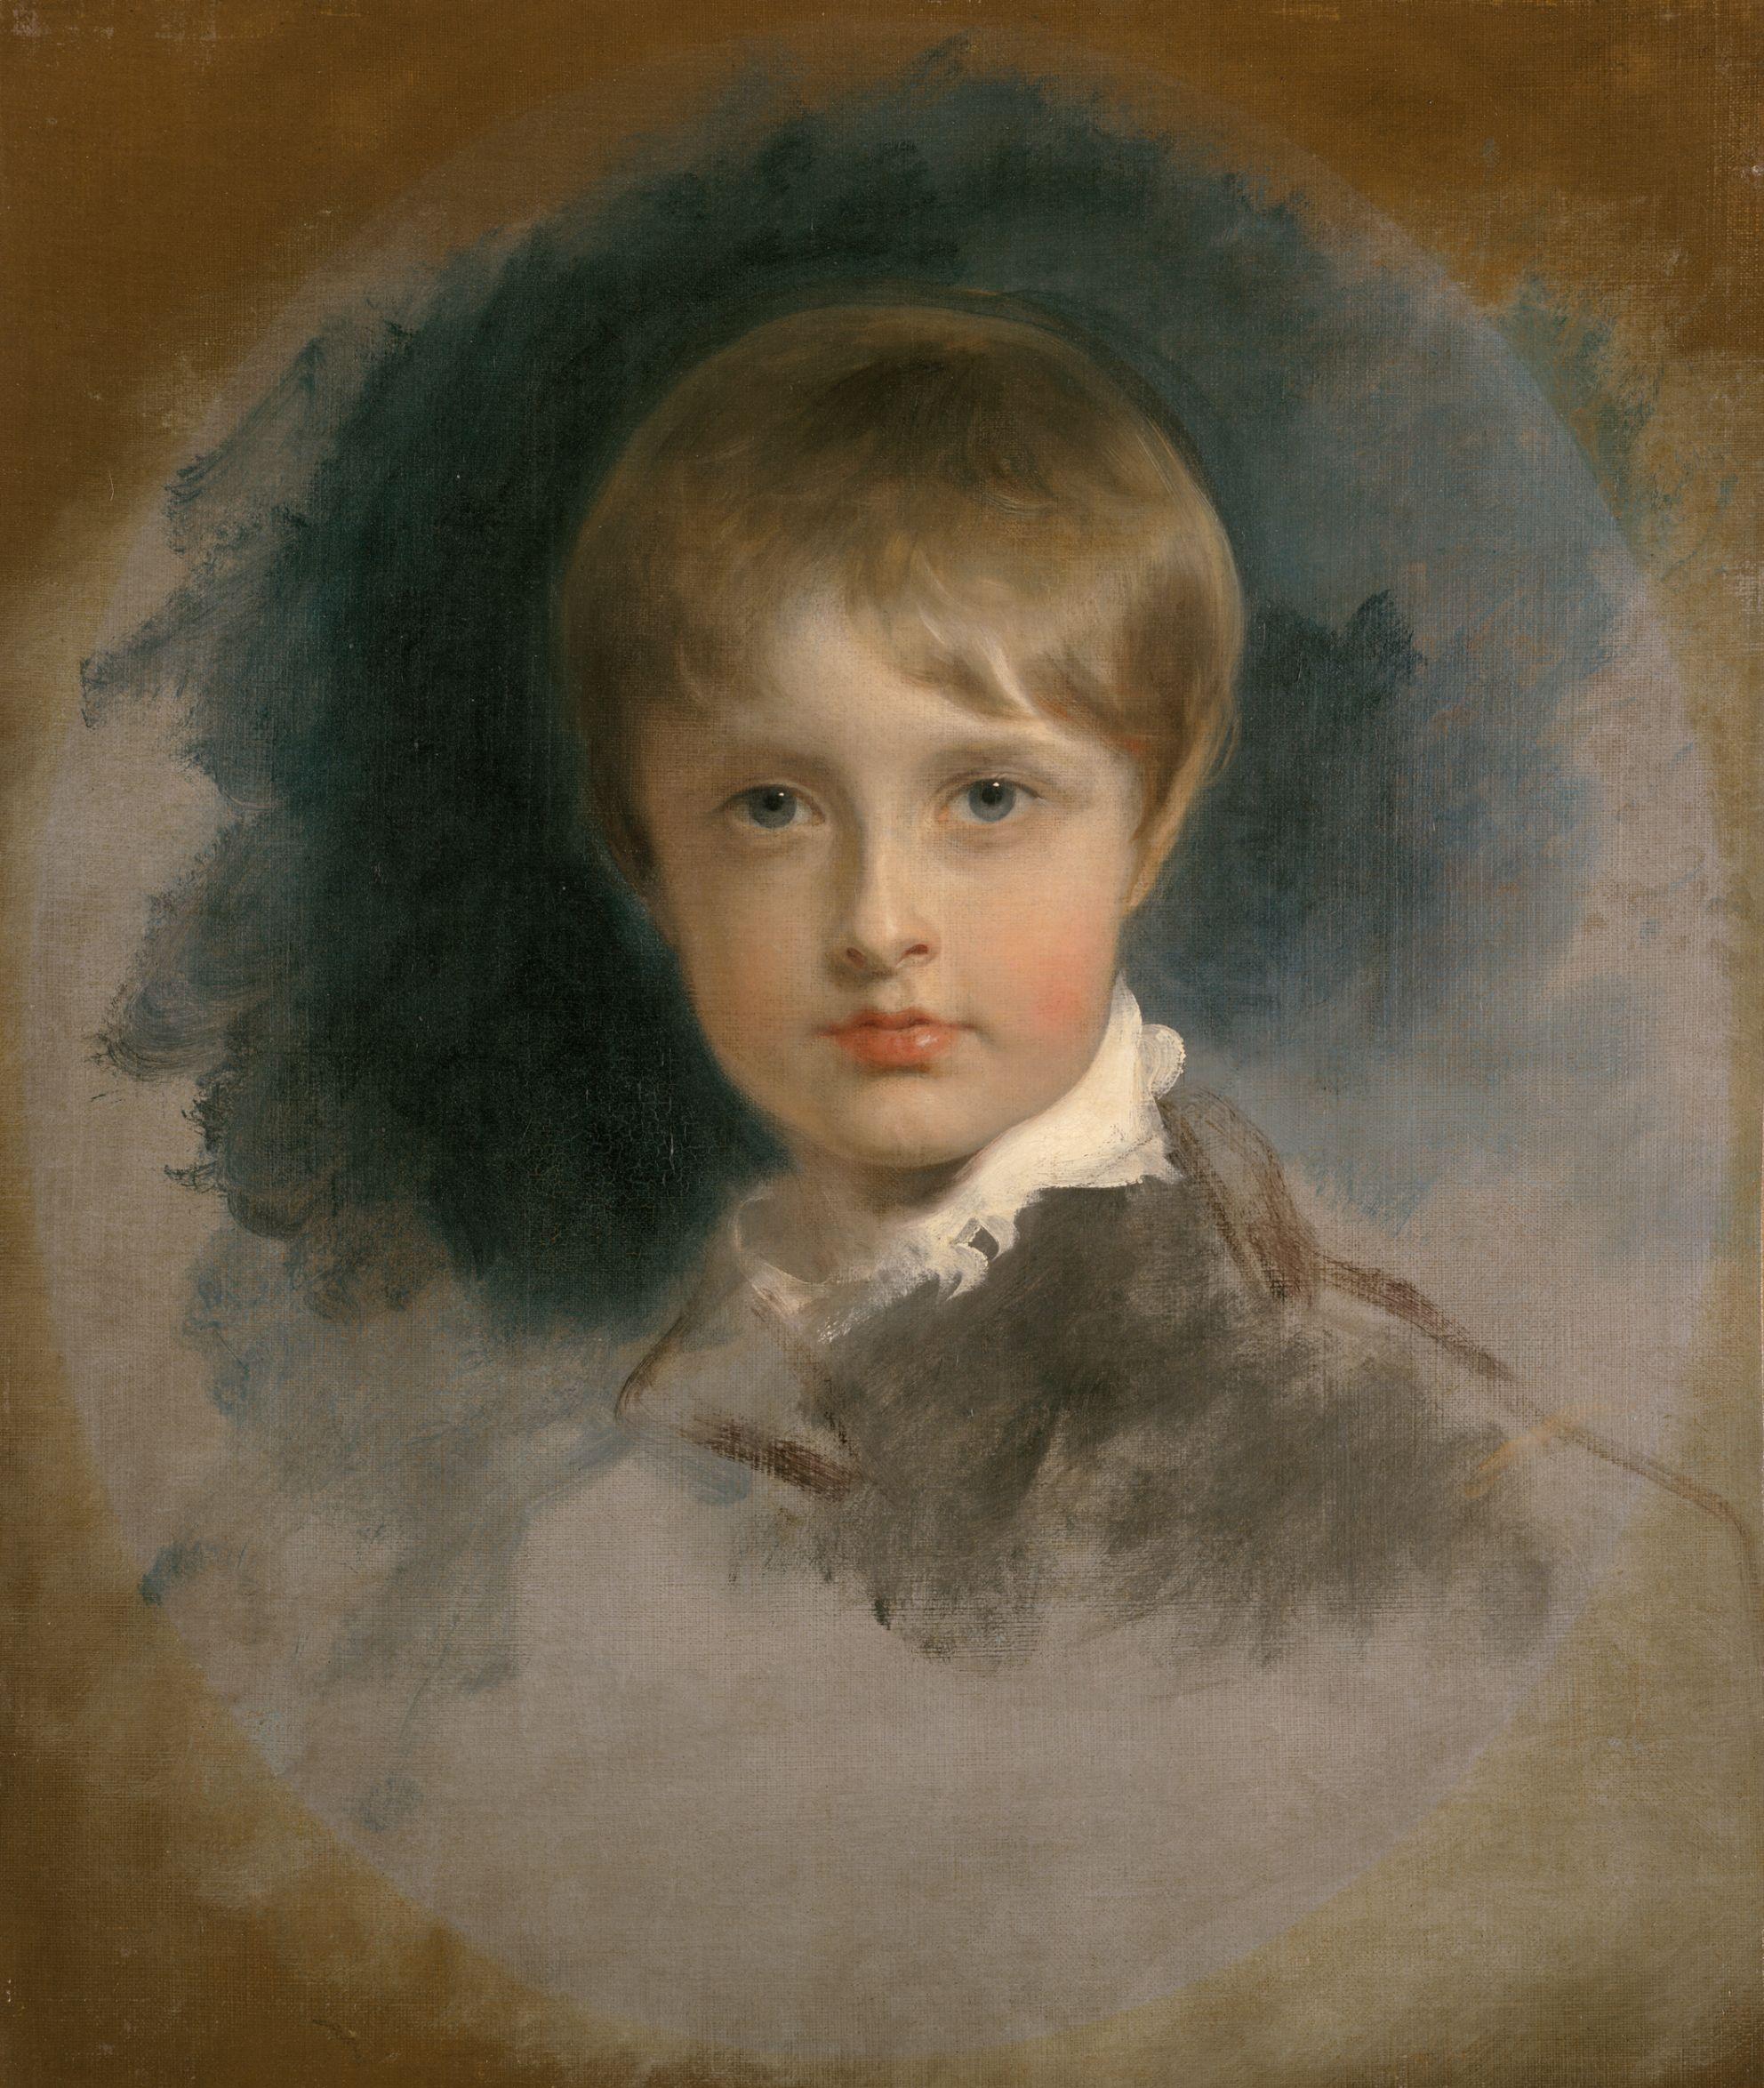 Fichier:Napoleon 2.jpg